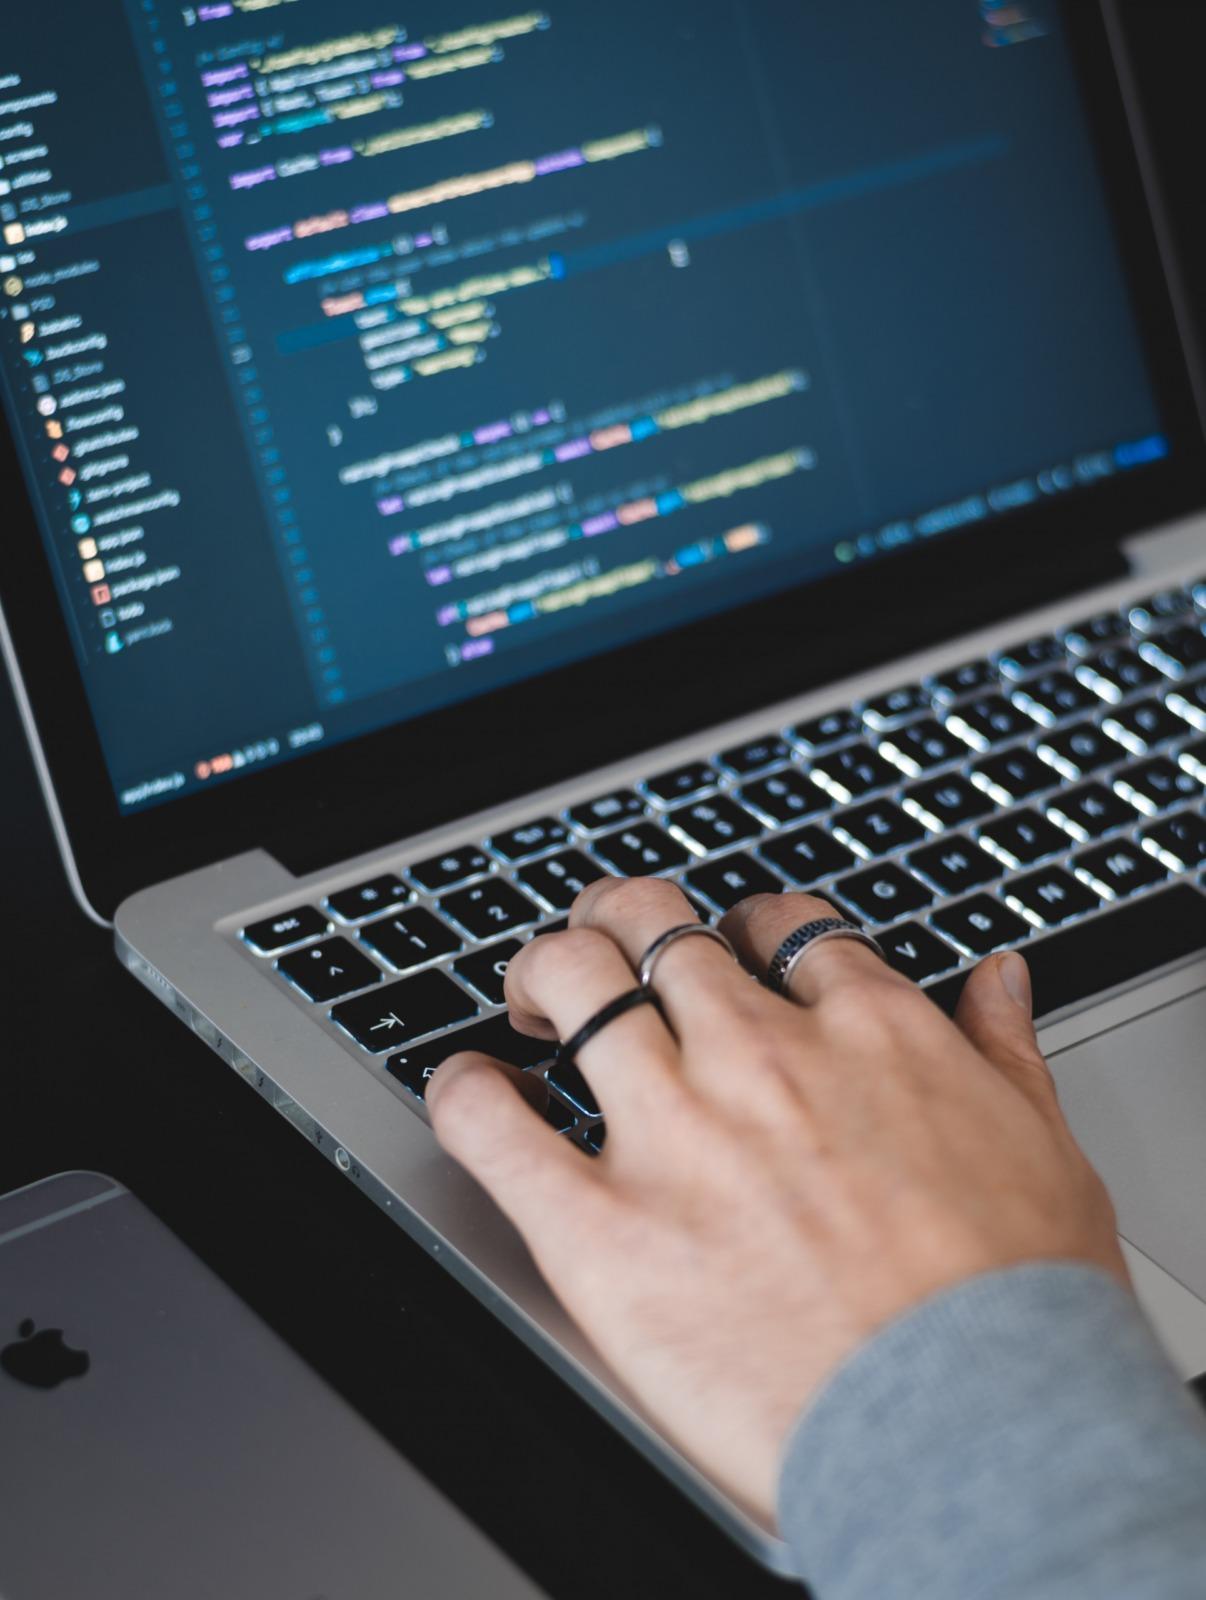 5 Developer Hiring Mistakes I Made As a Tech Recruiter Before 2020